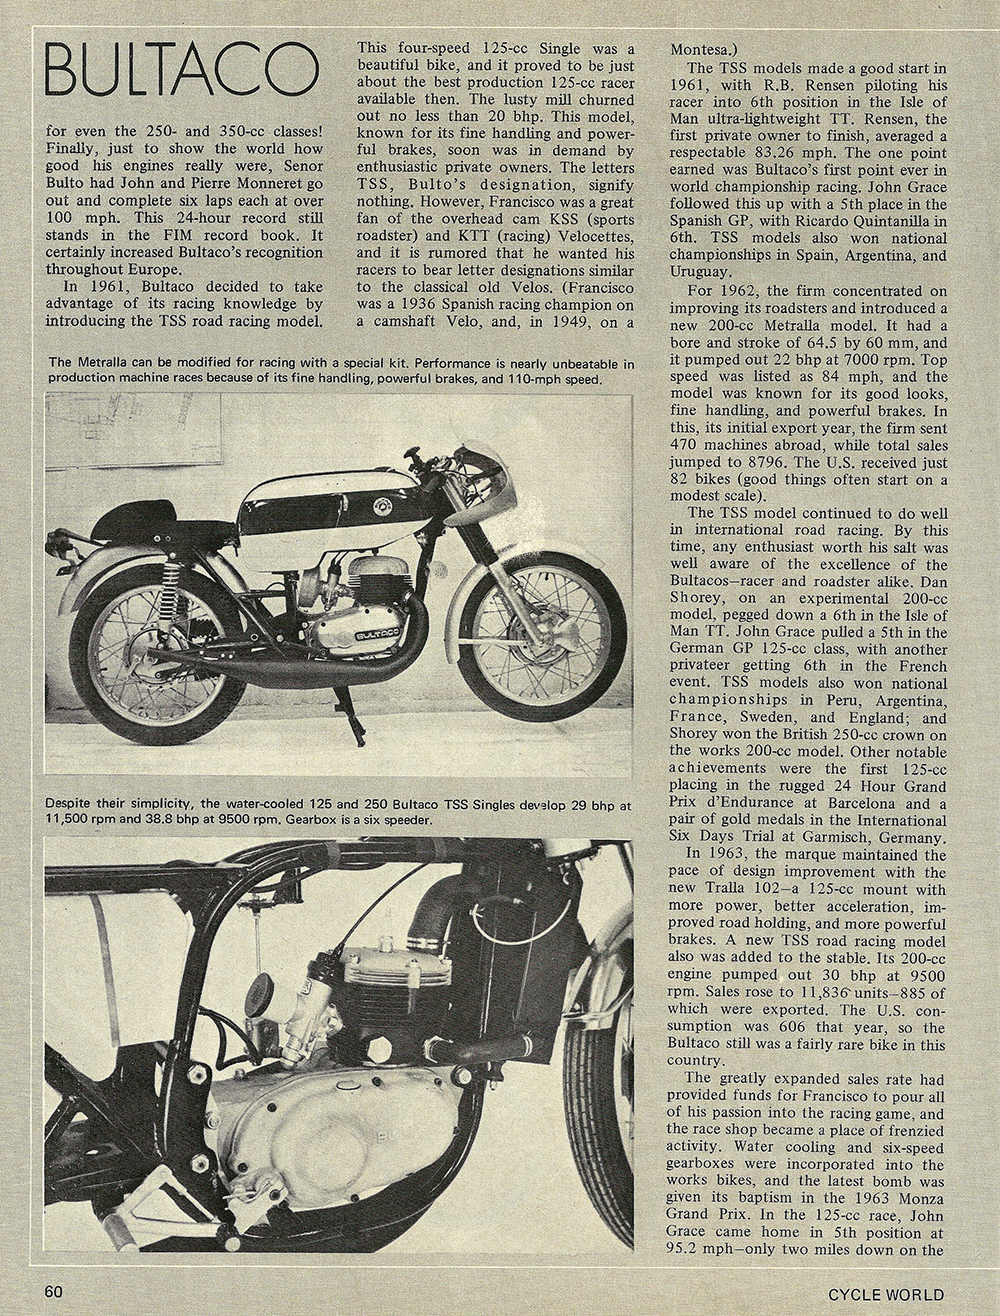 History of Bultaco 03.jpg